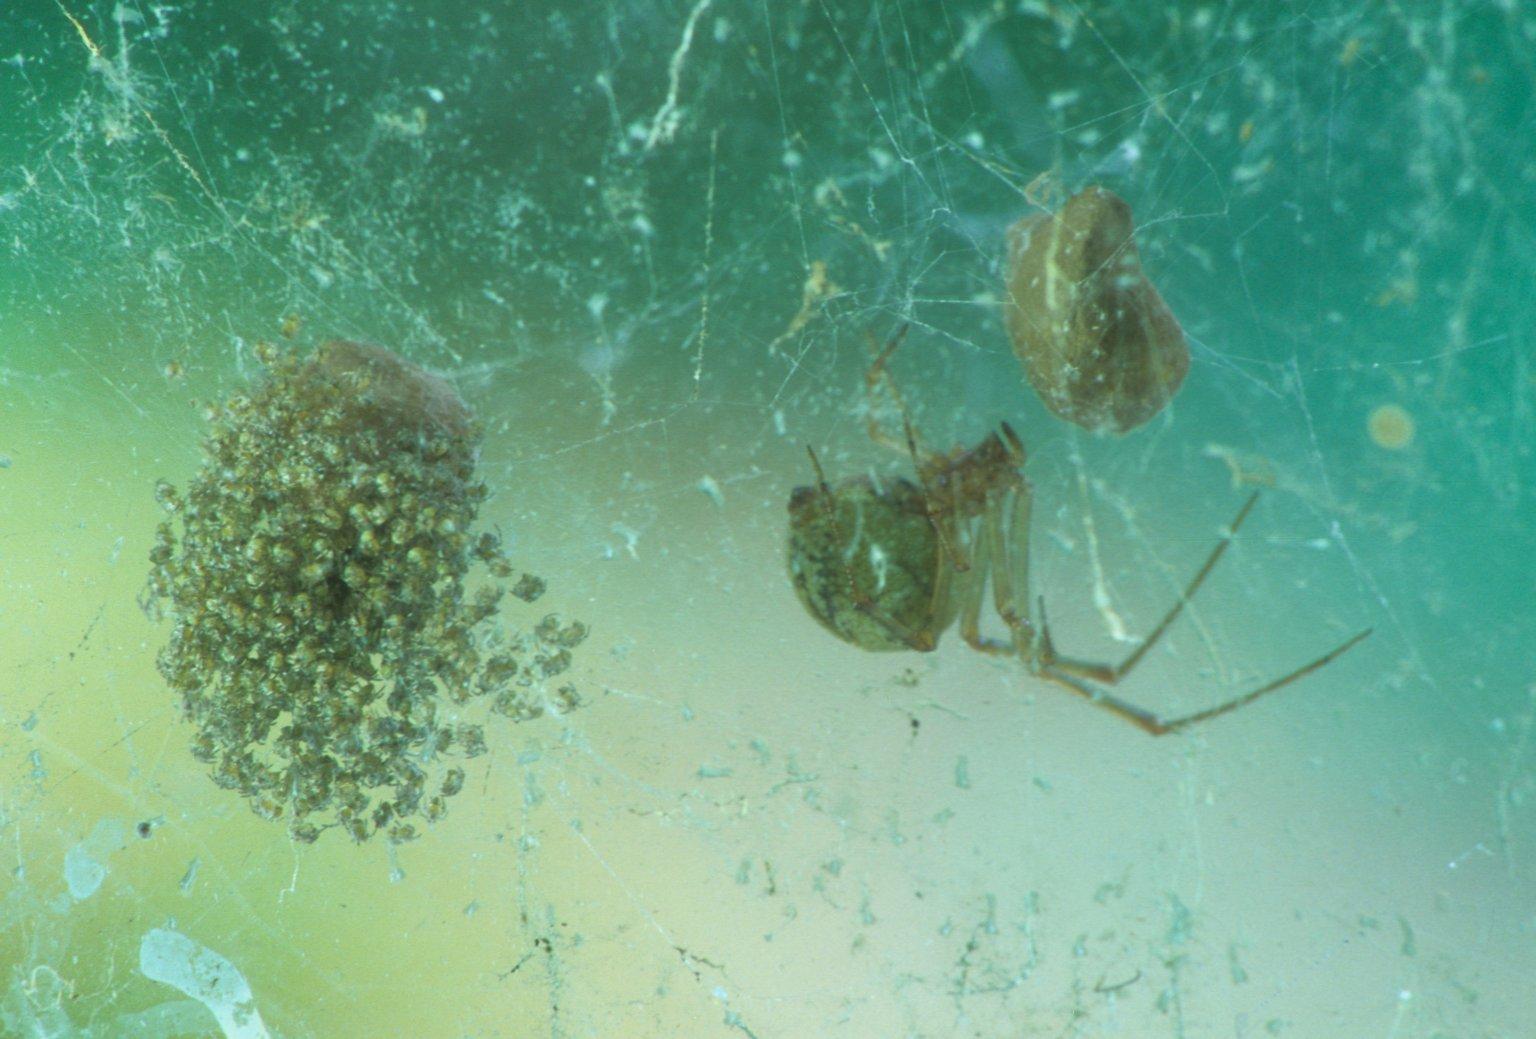 Cob web spider (Theridiidae)